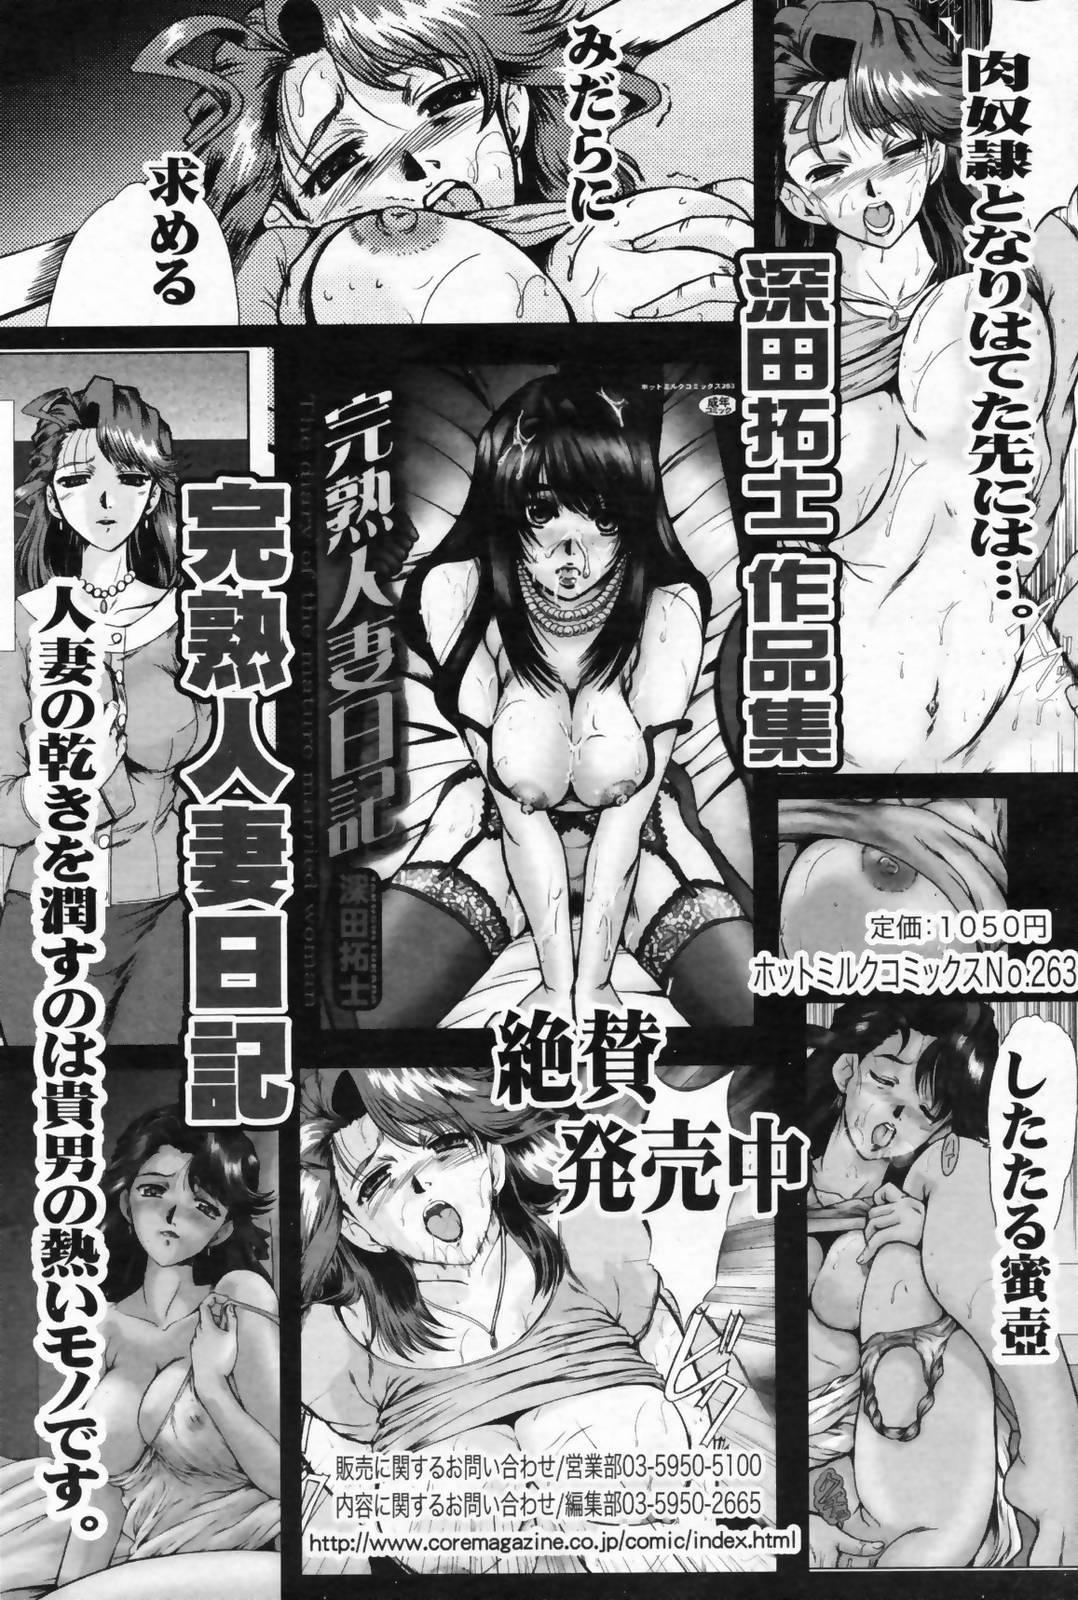 Manga Bangaichi 2009-02 Vol. 234 179